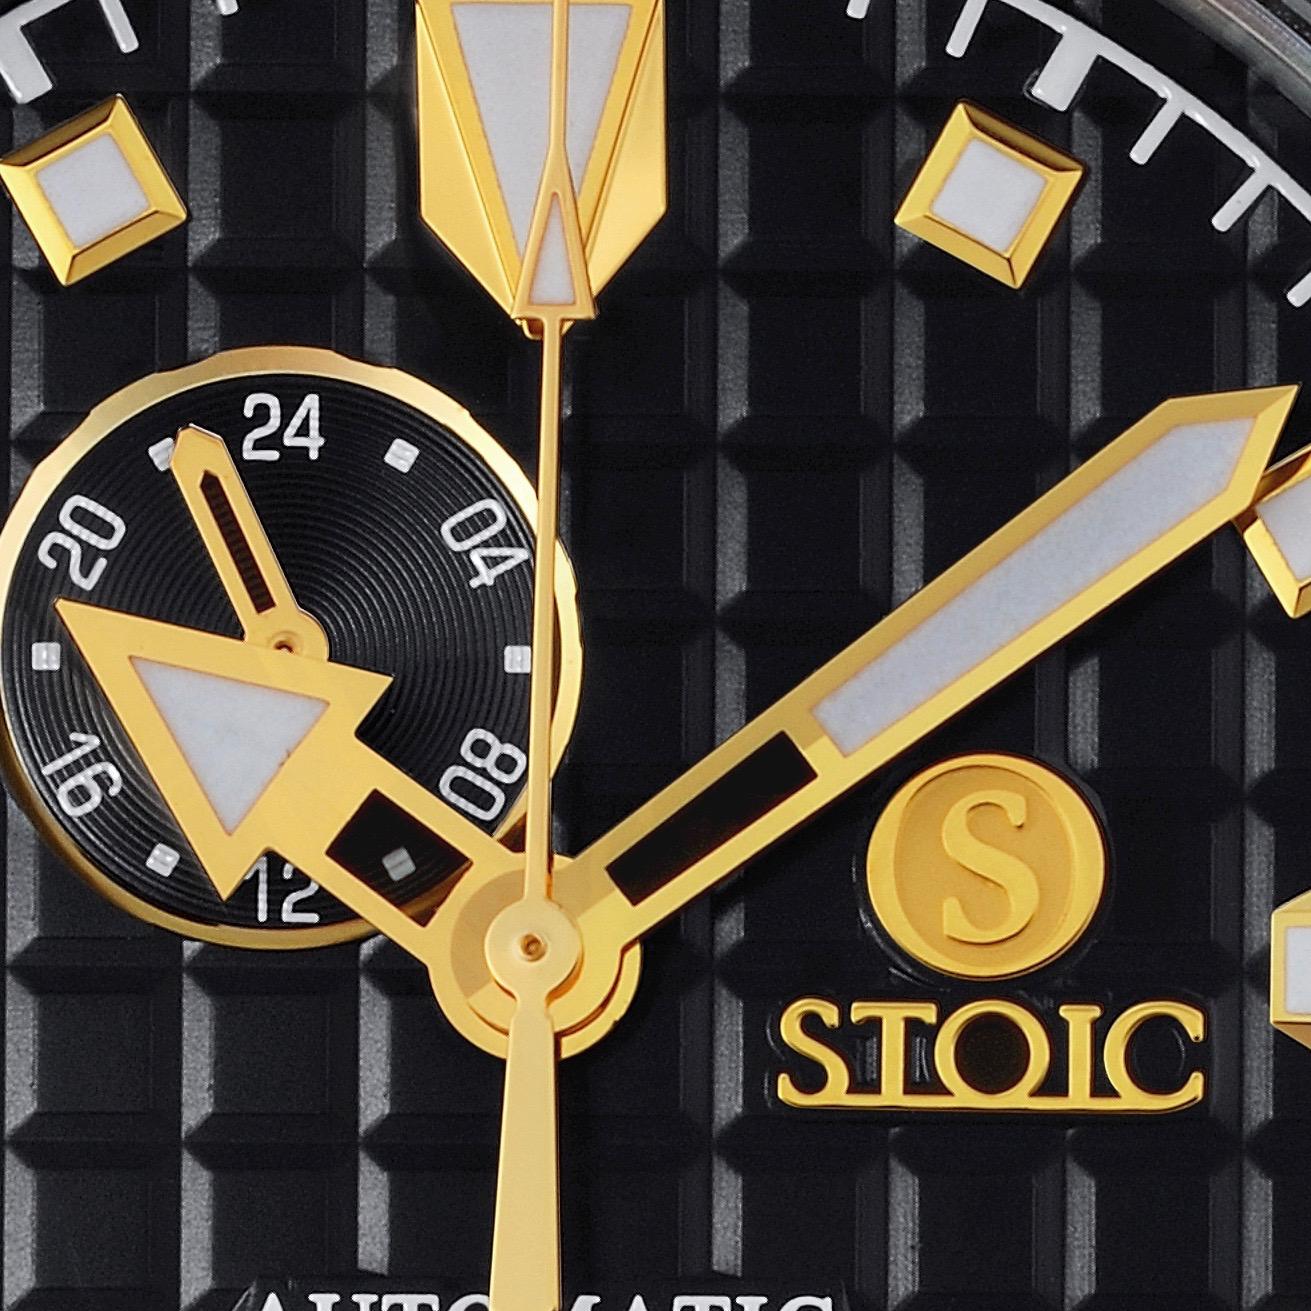 Stoic sports watch